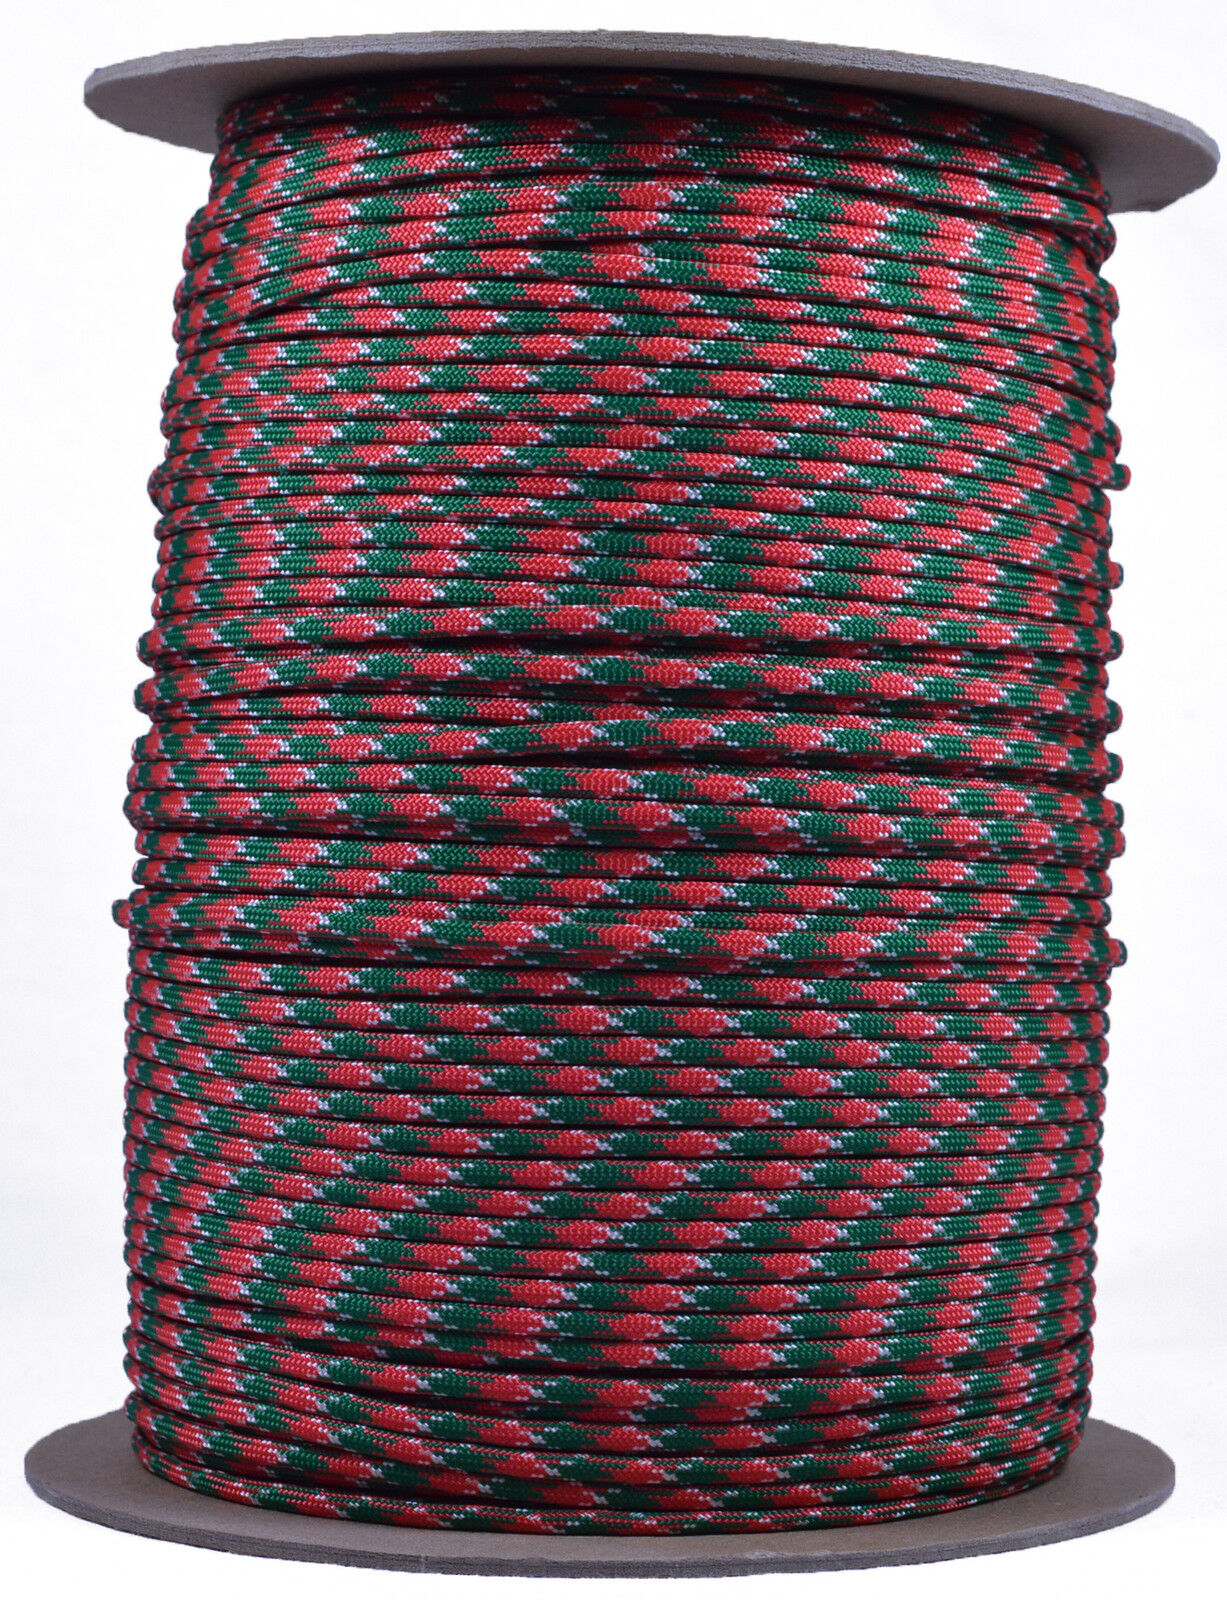 Holly Jolly  550 Paracord Rope 7 strand Parachute Cord  1000 Foot Spool